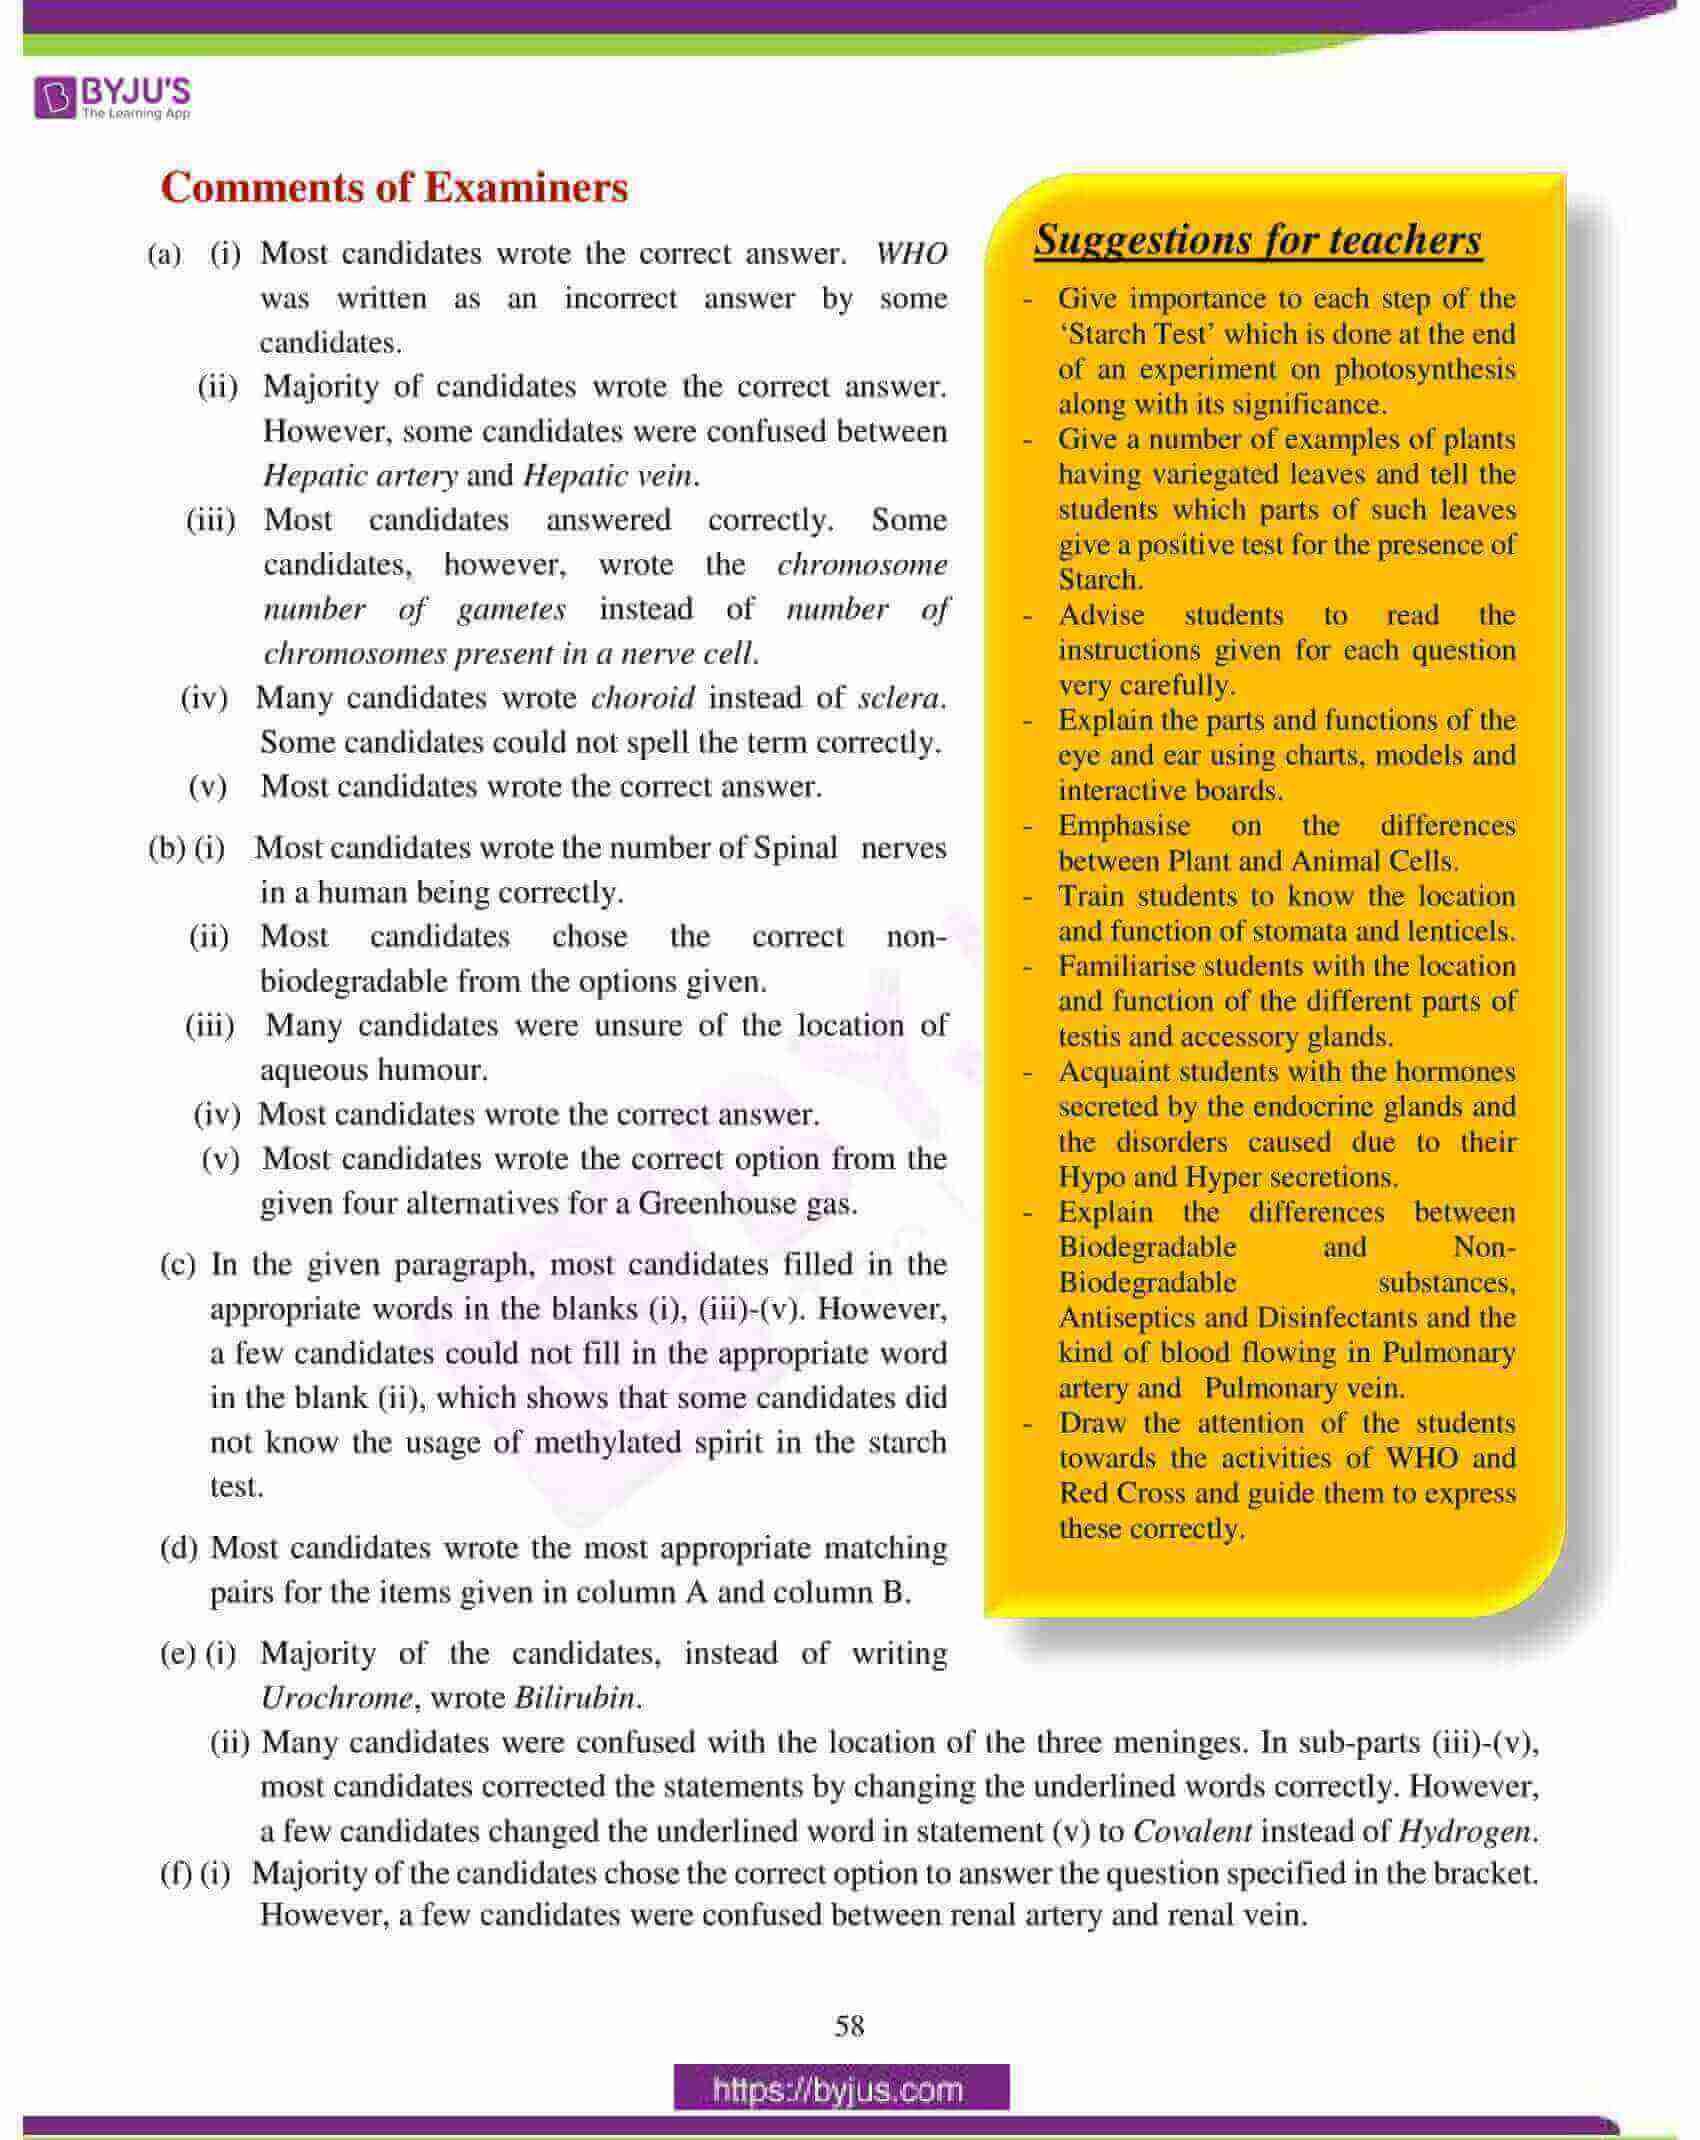 icse class 10 biology question paper solution 2018 05